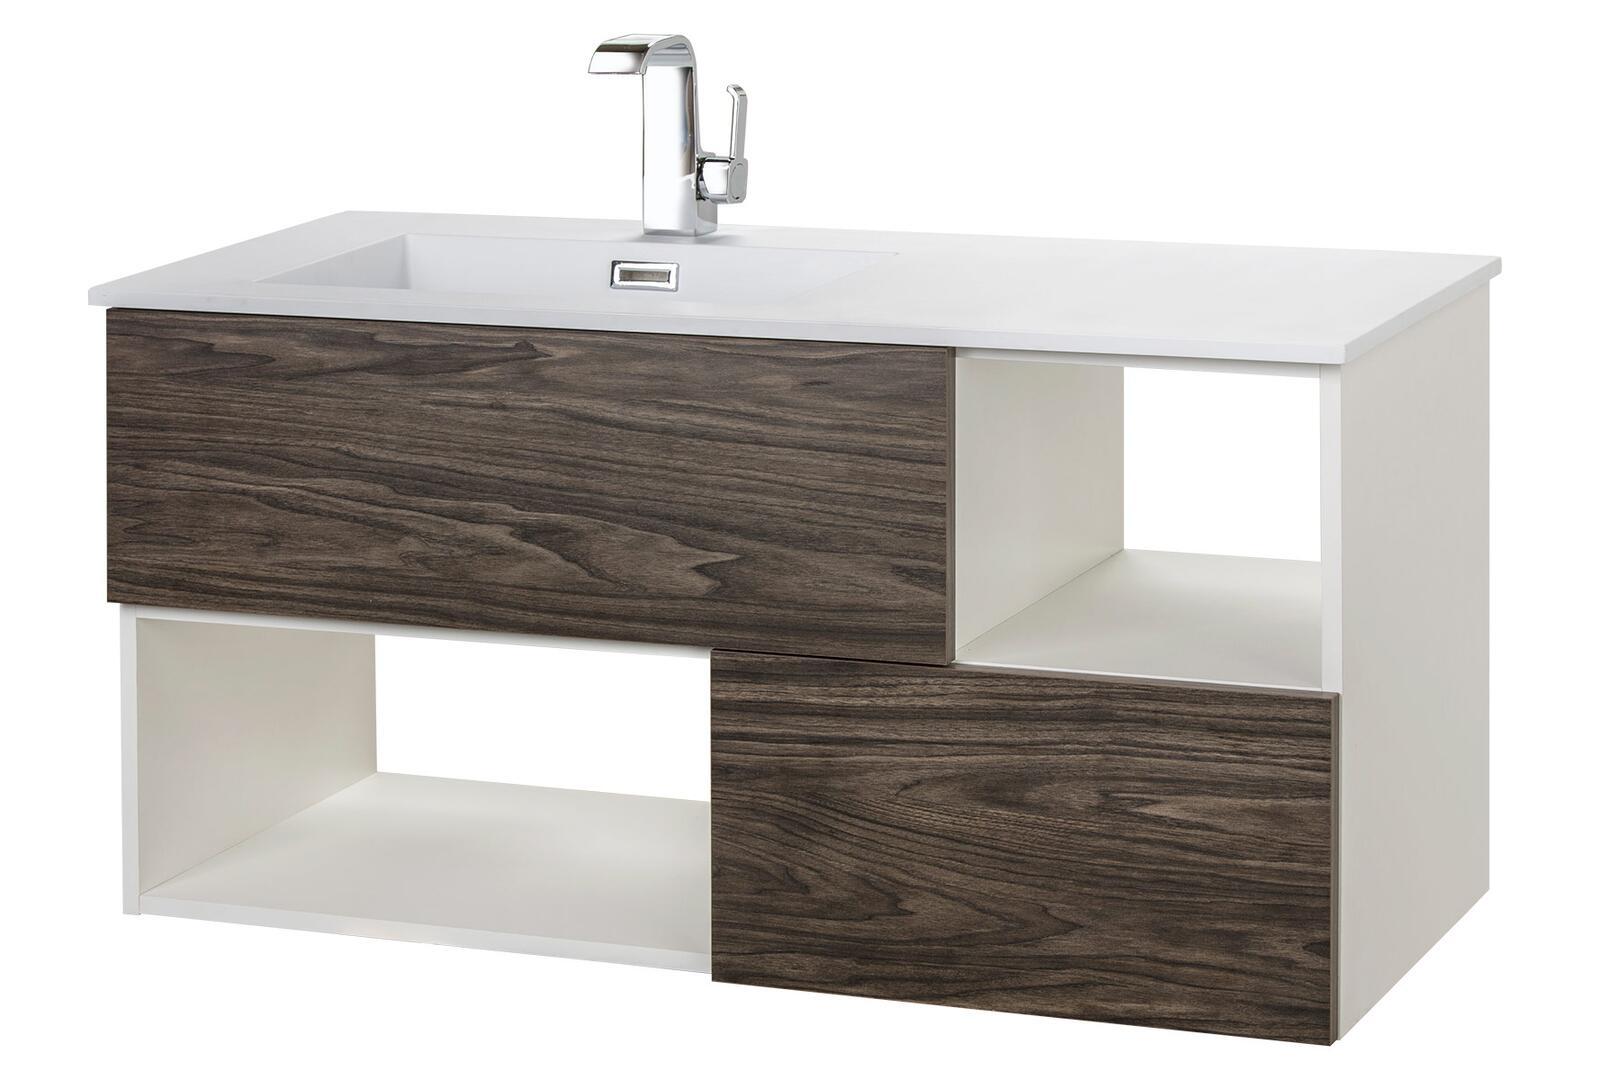 ... Cutler Kitchen And Bath Sangallo Angle View ...